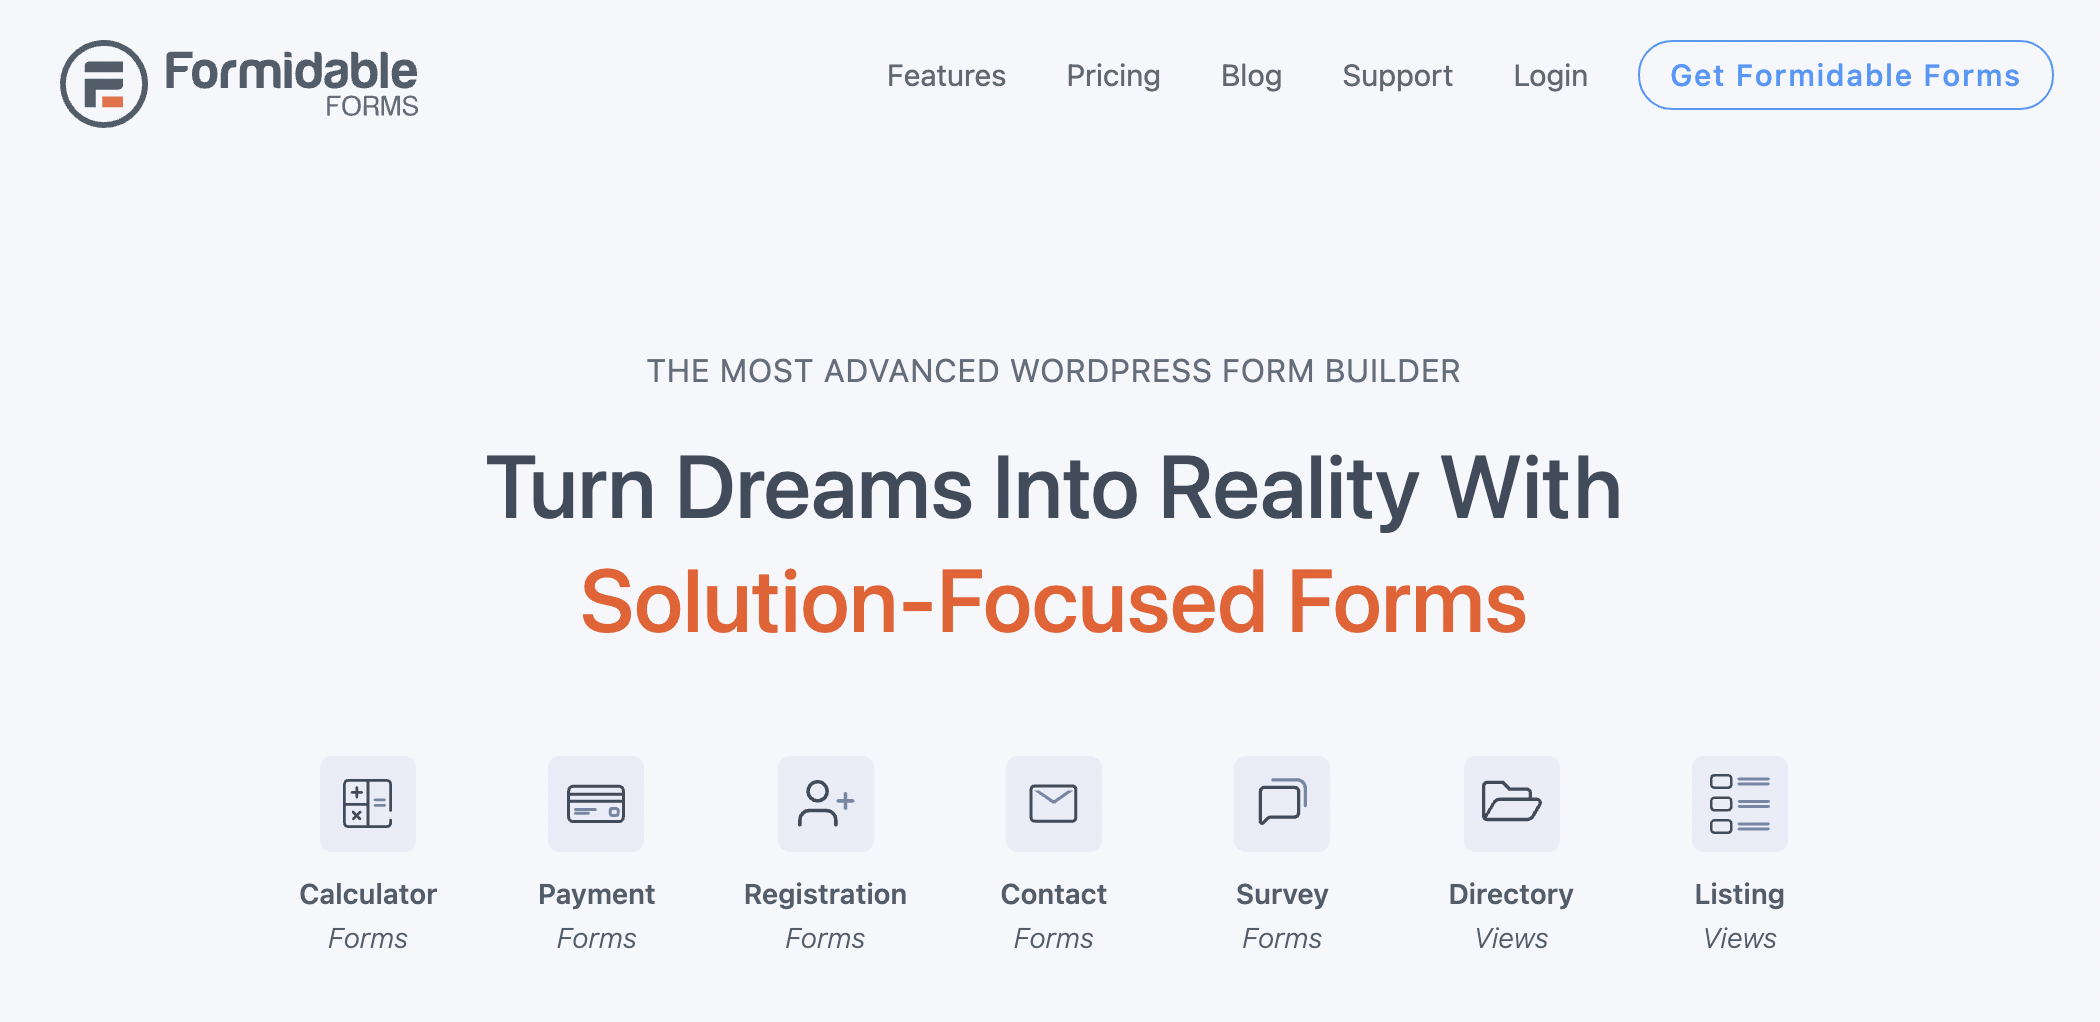 Formidable Forms - WordPress Poll Plugin